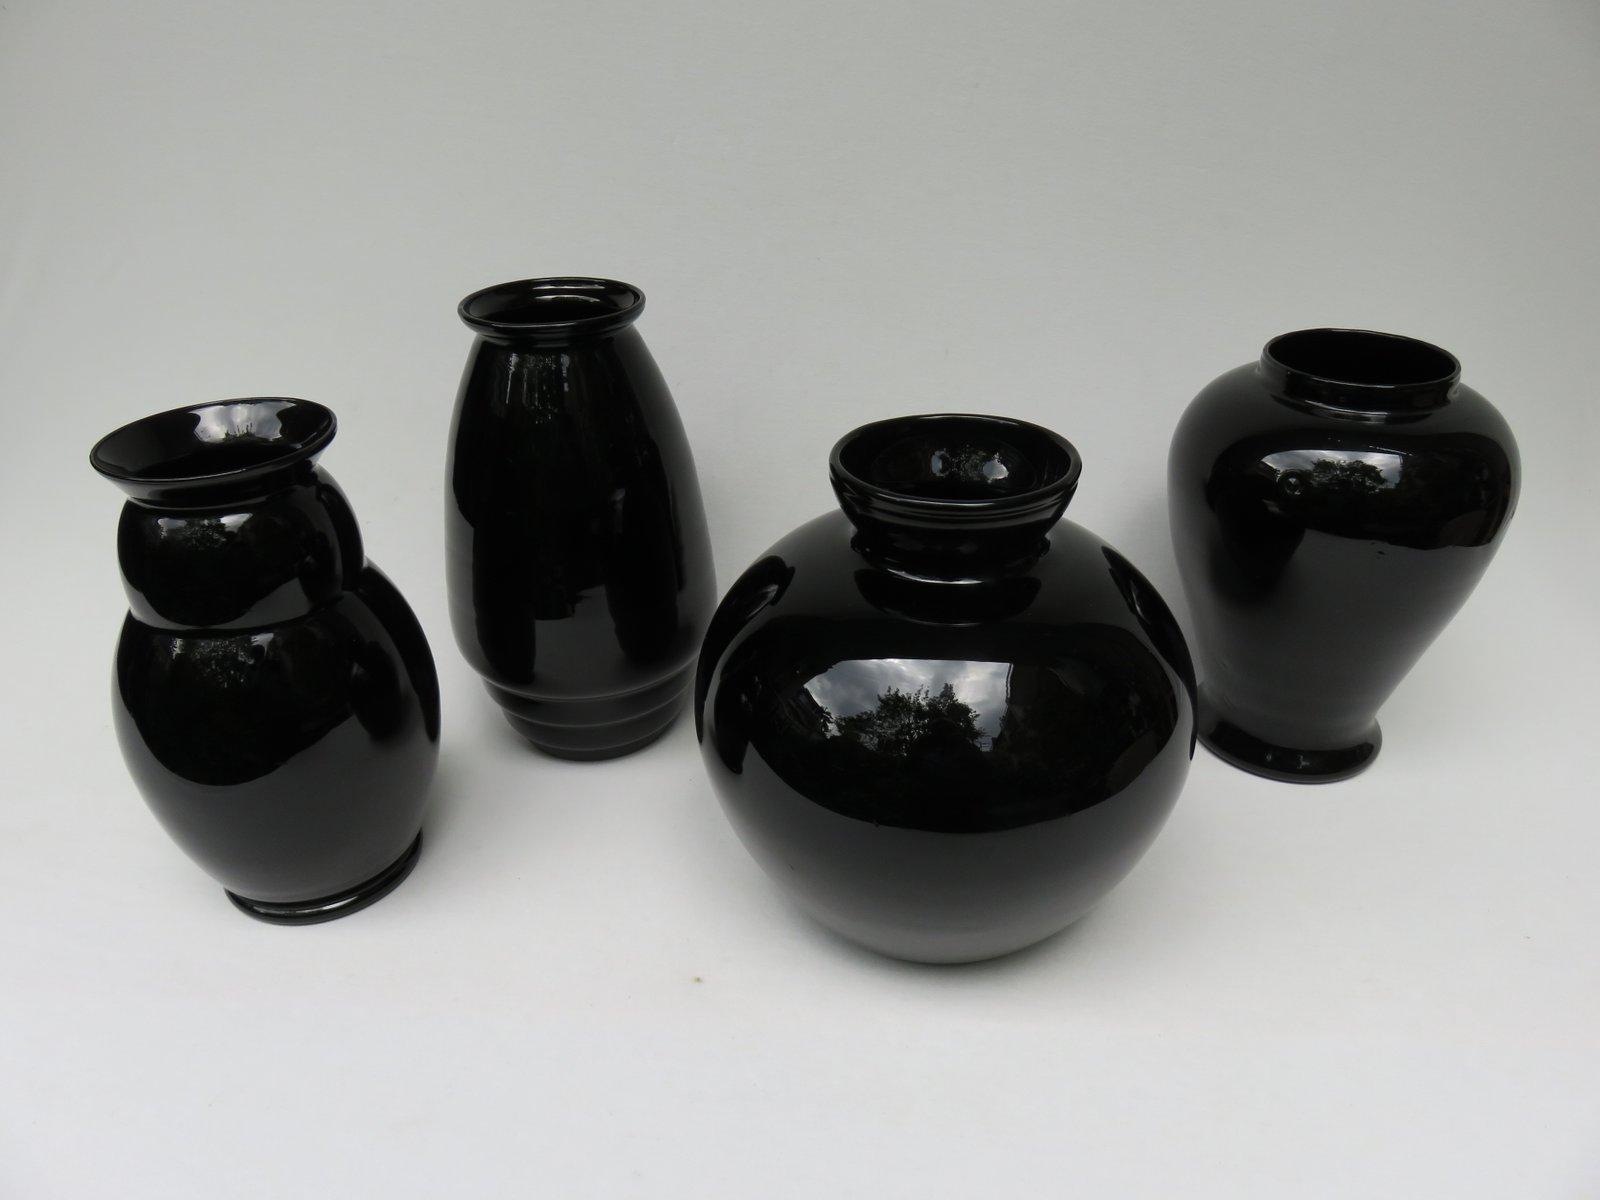 VTG Black /& White Vase